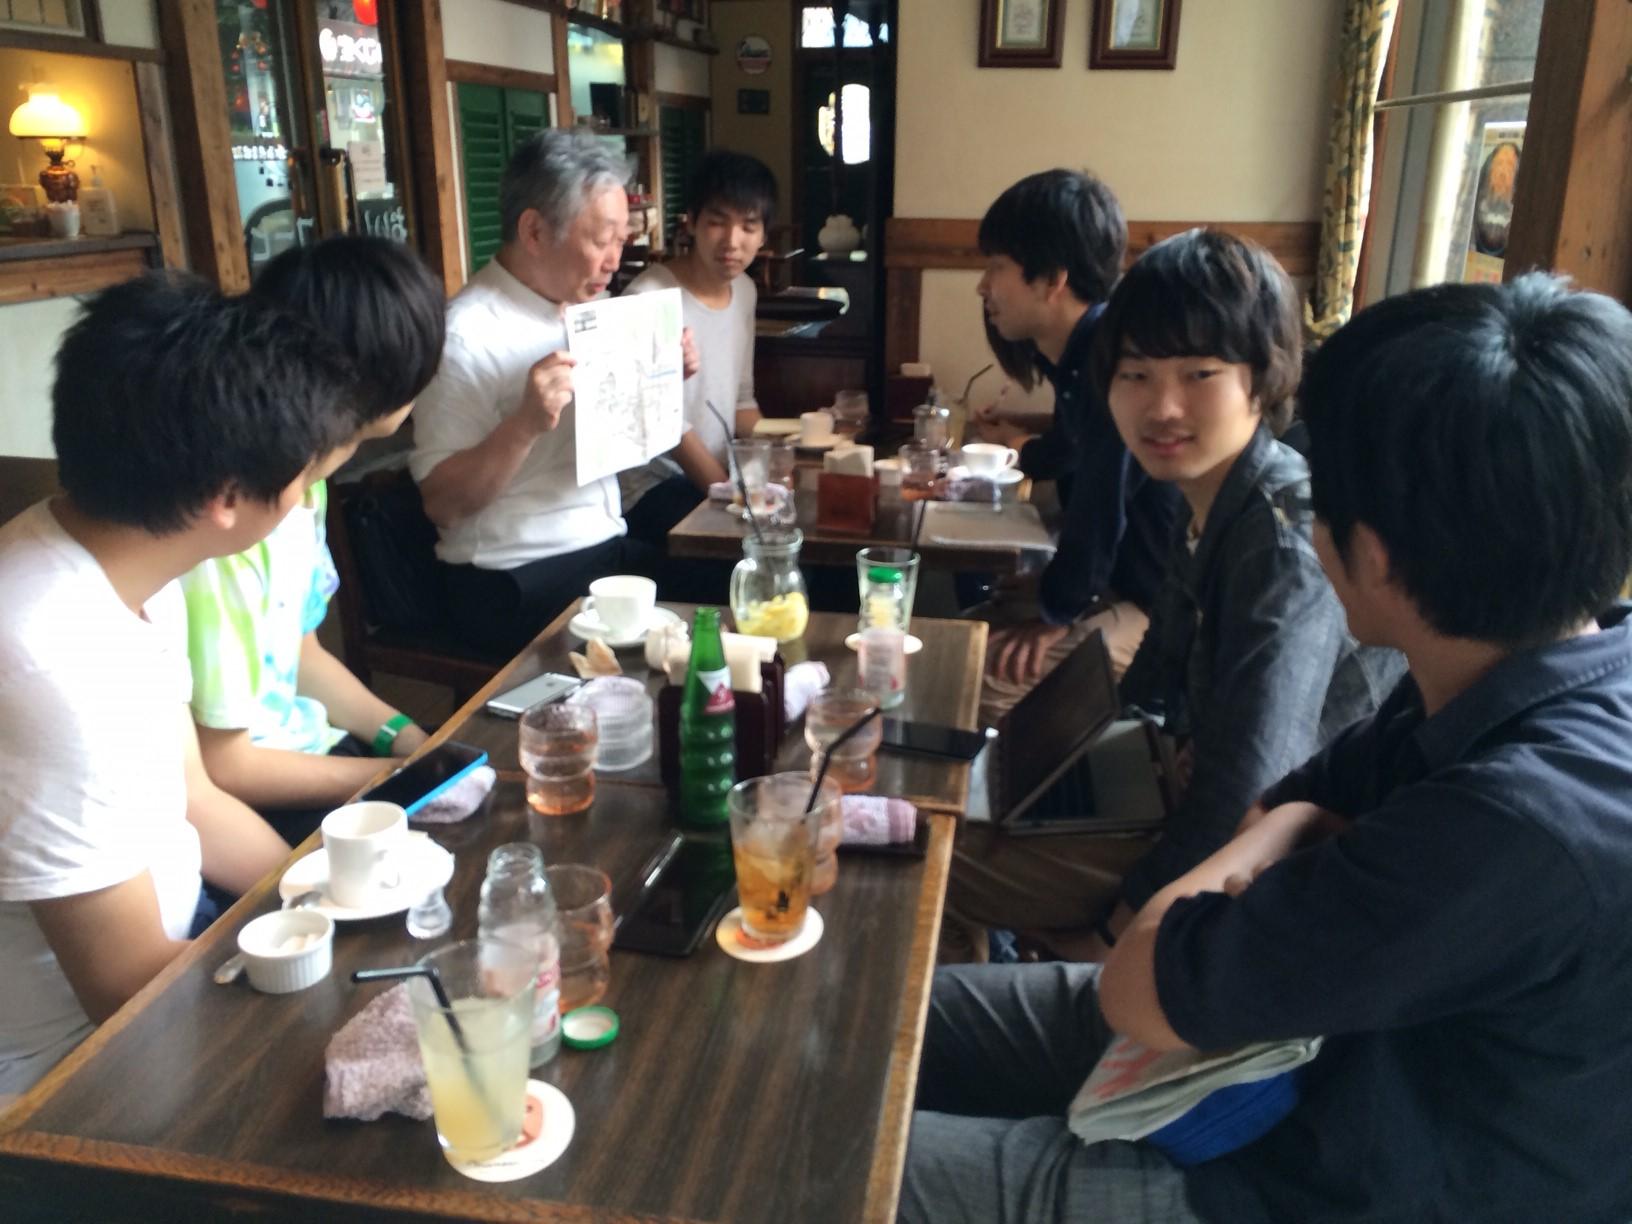 http://ud.t.u-tokyo.ac.jp/blog/_images/%E5%86%99%E7%9C%9F.JPG